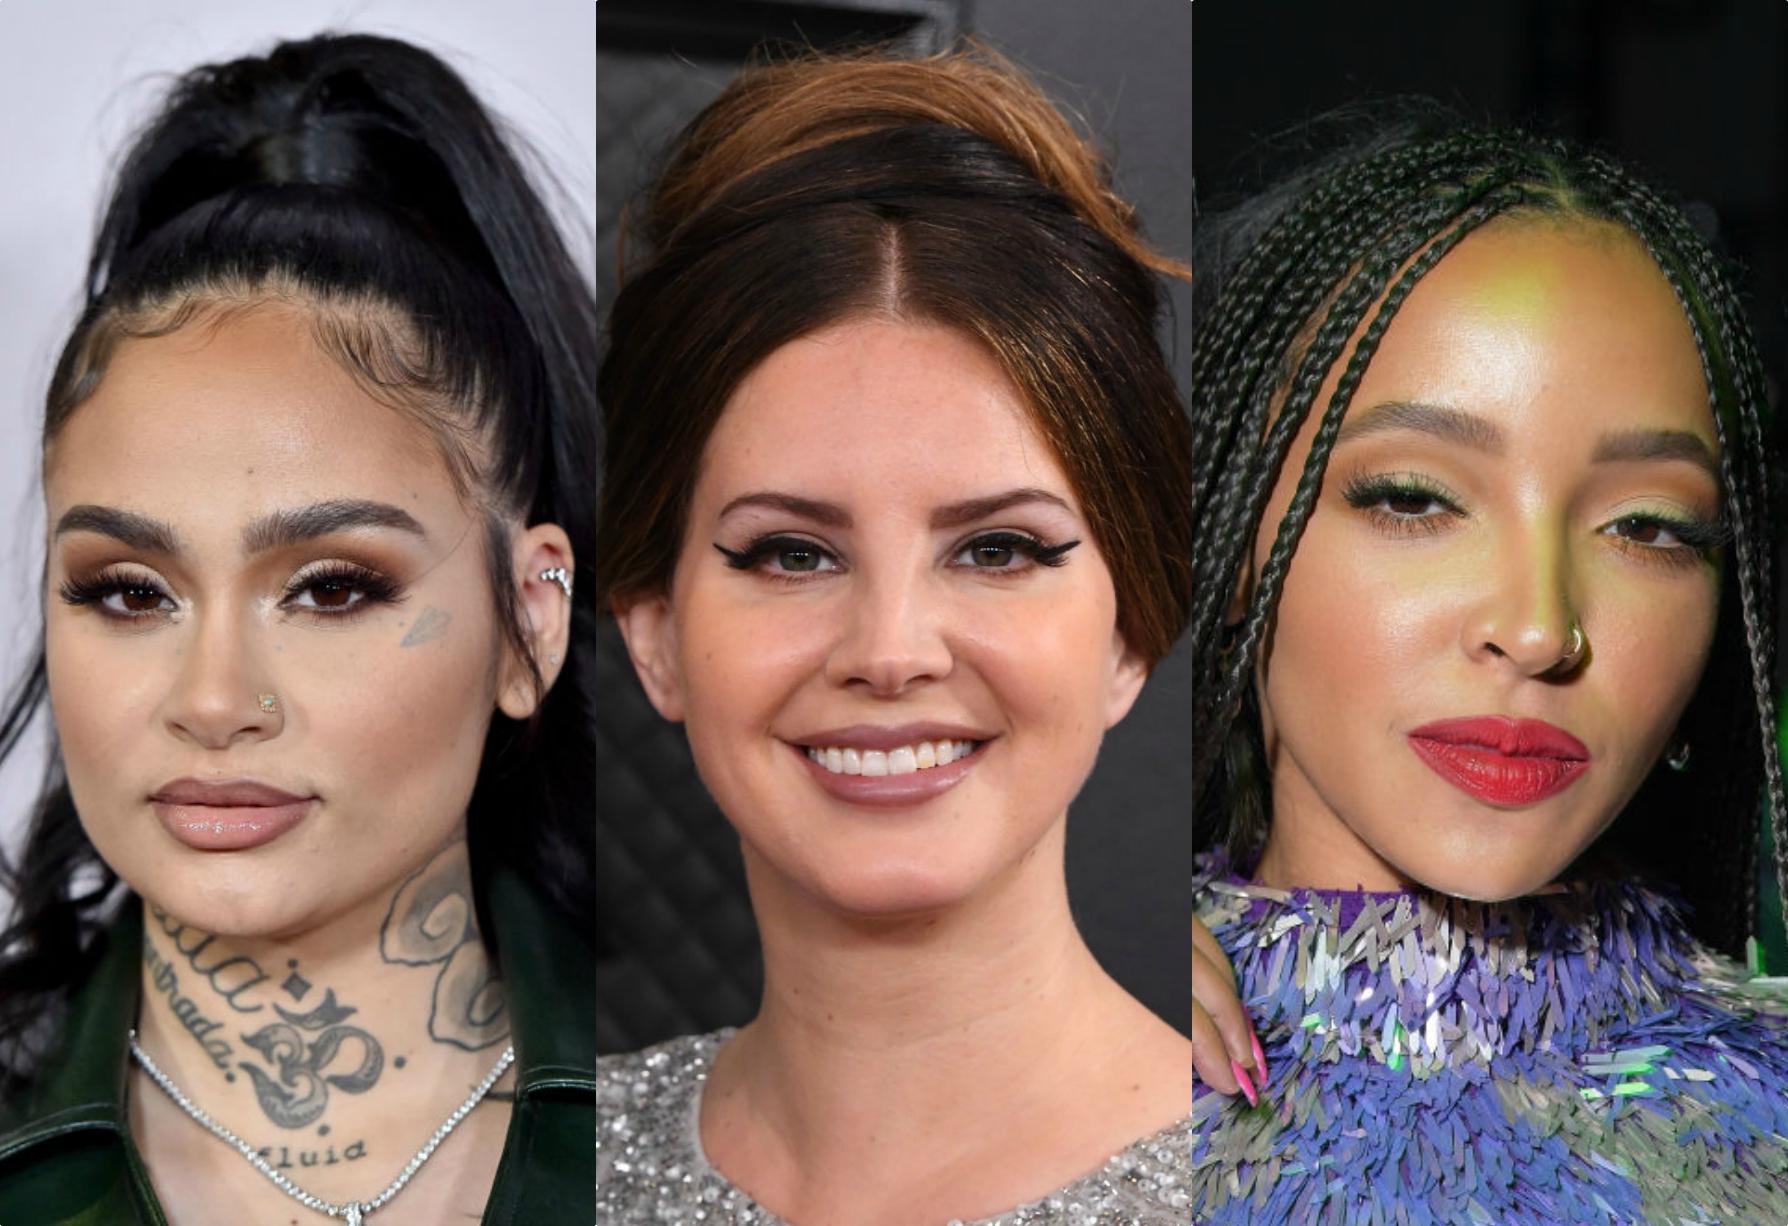 Lana Del ray, Kehlani, Tinashe